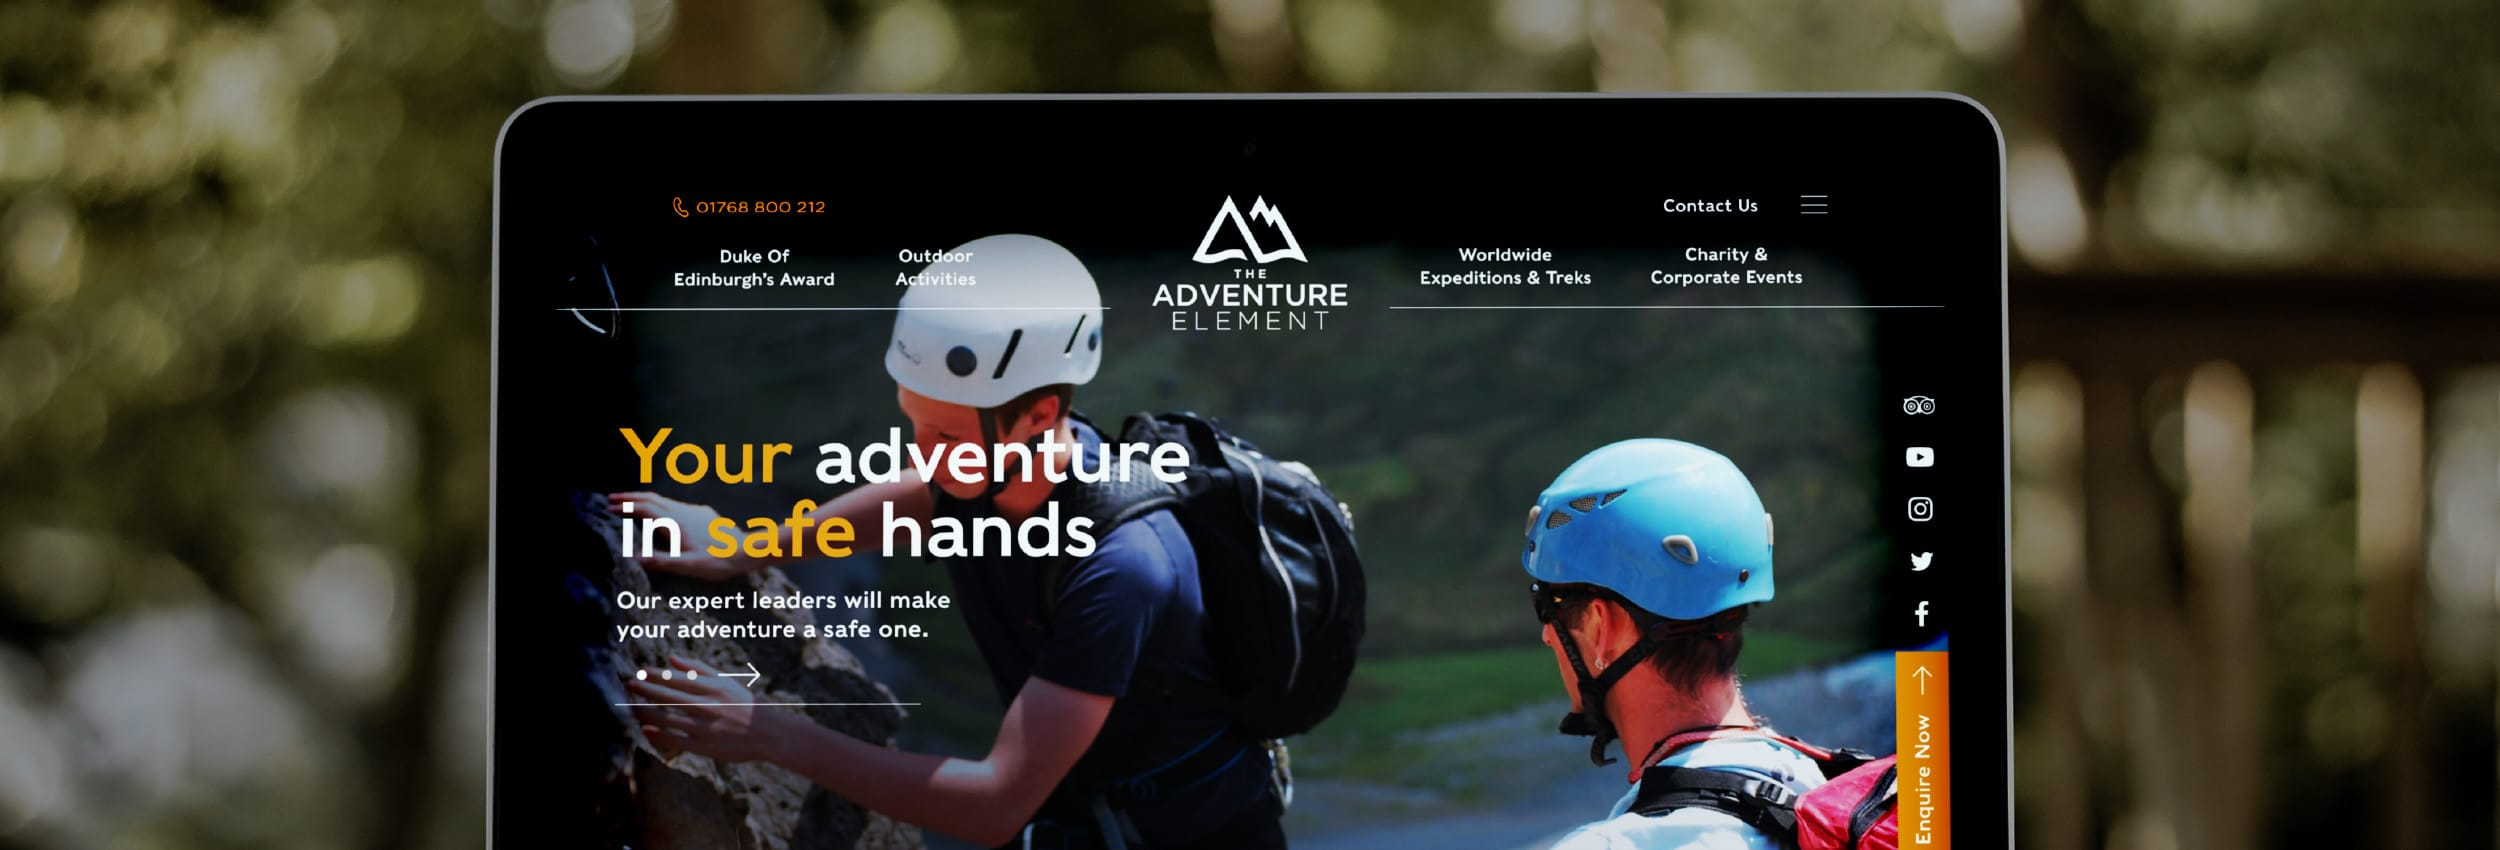 The Adventure Element